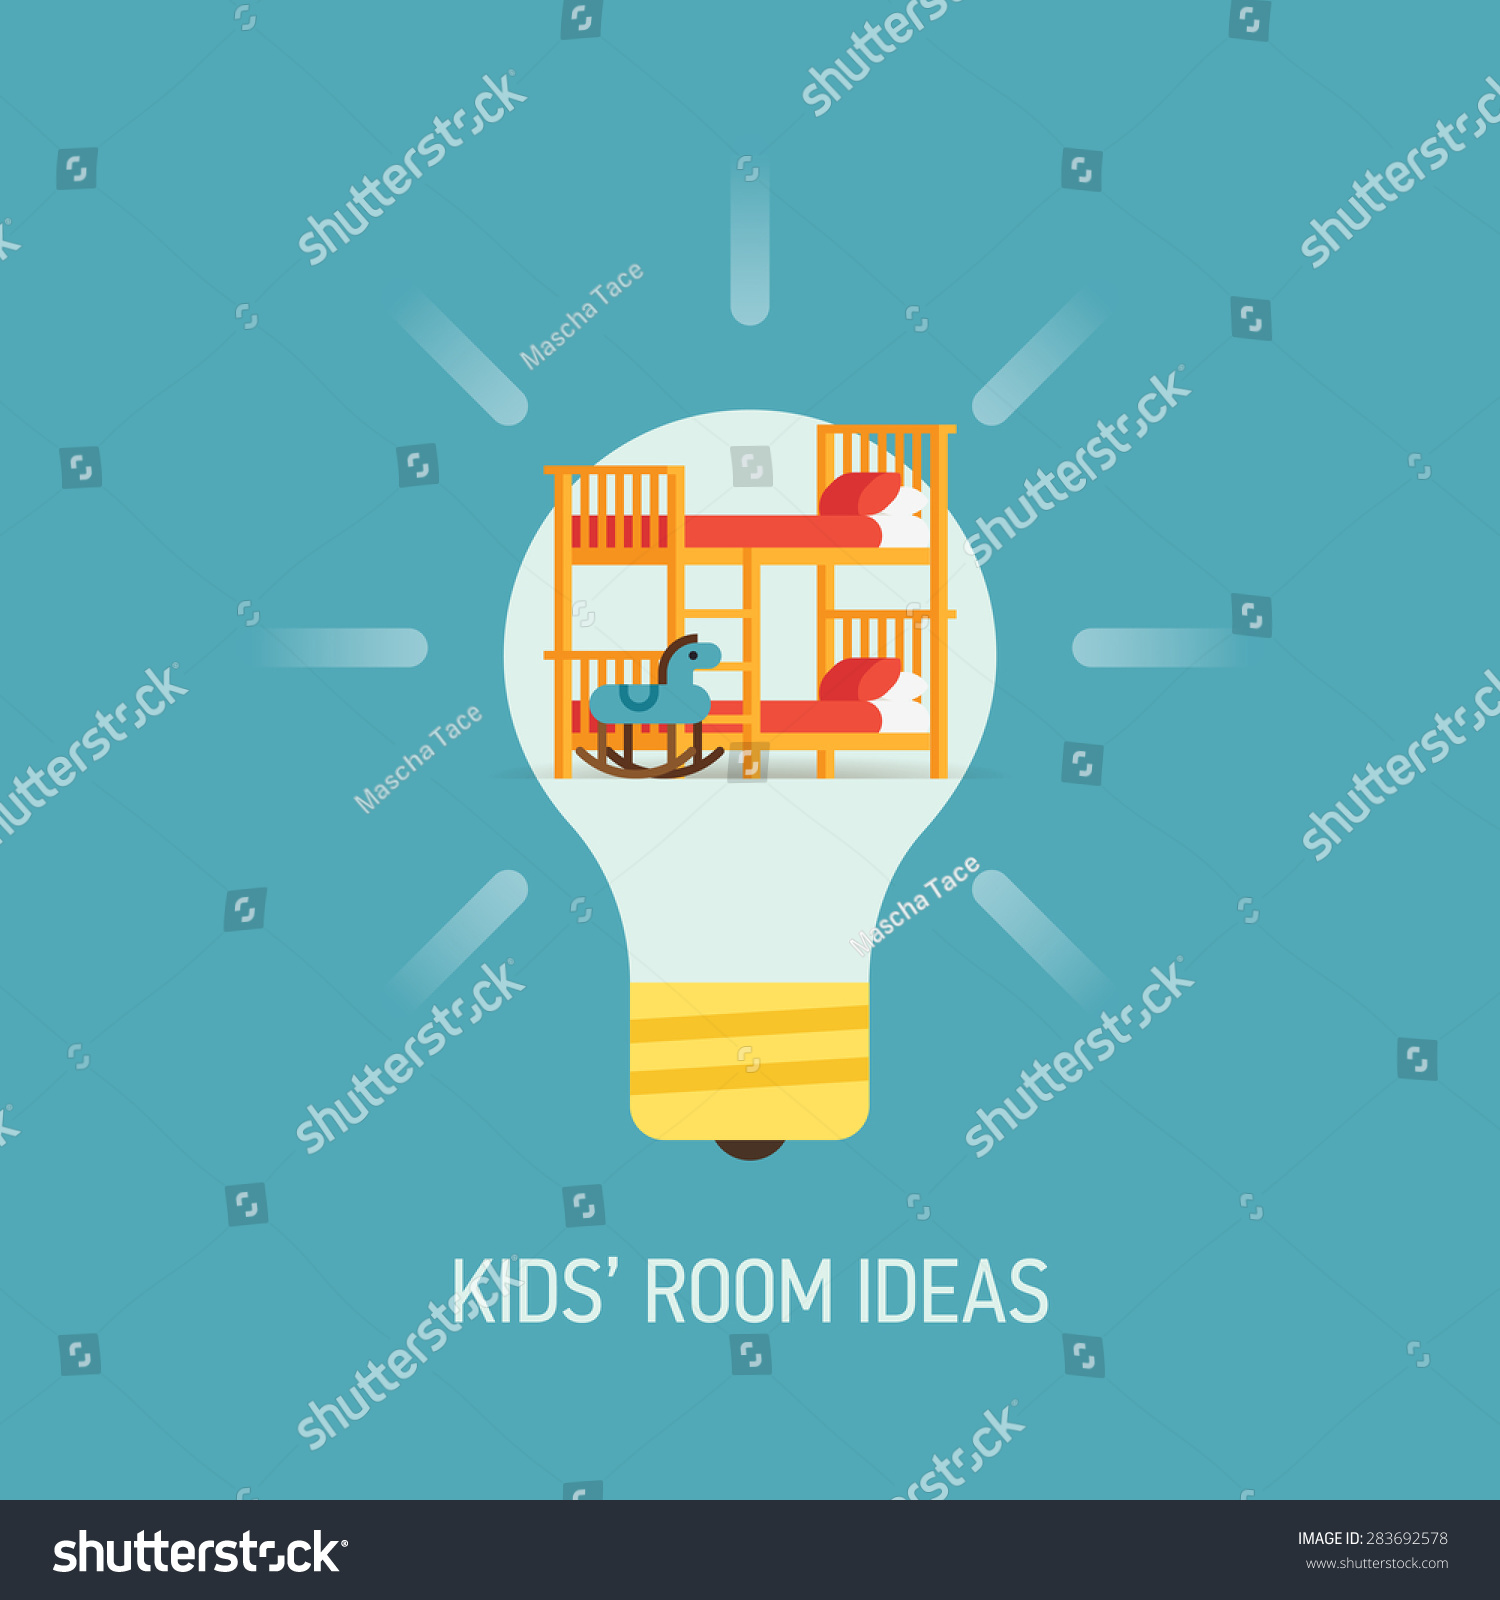 Kids Room Decoration Space Theme Vector Illustration: Cool Vector Flat Design Web Banner Stock Vector 283692578